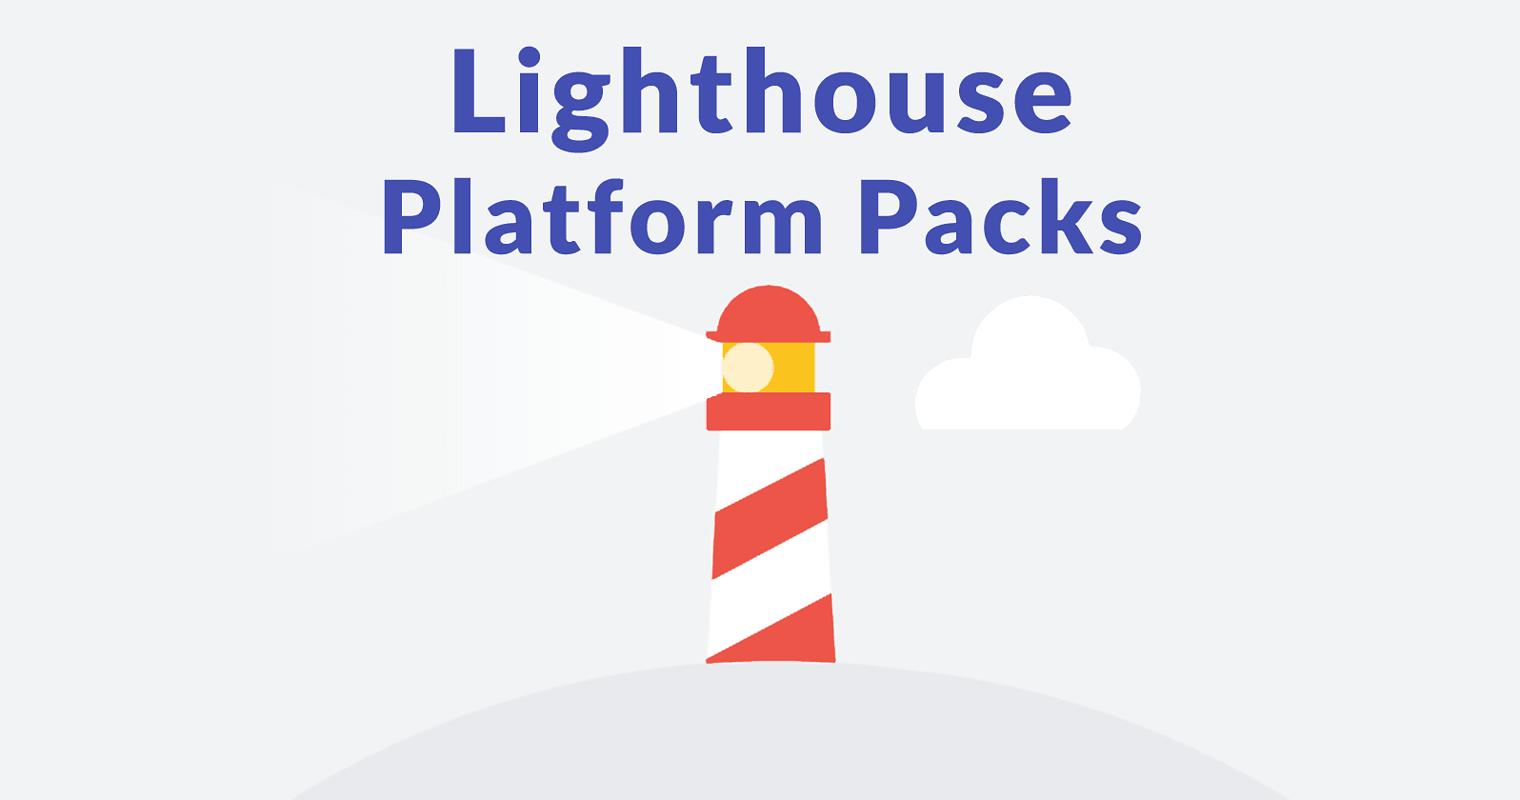 Google Lighthouse Update – Platform Packs Announced